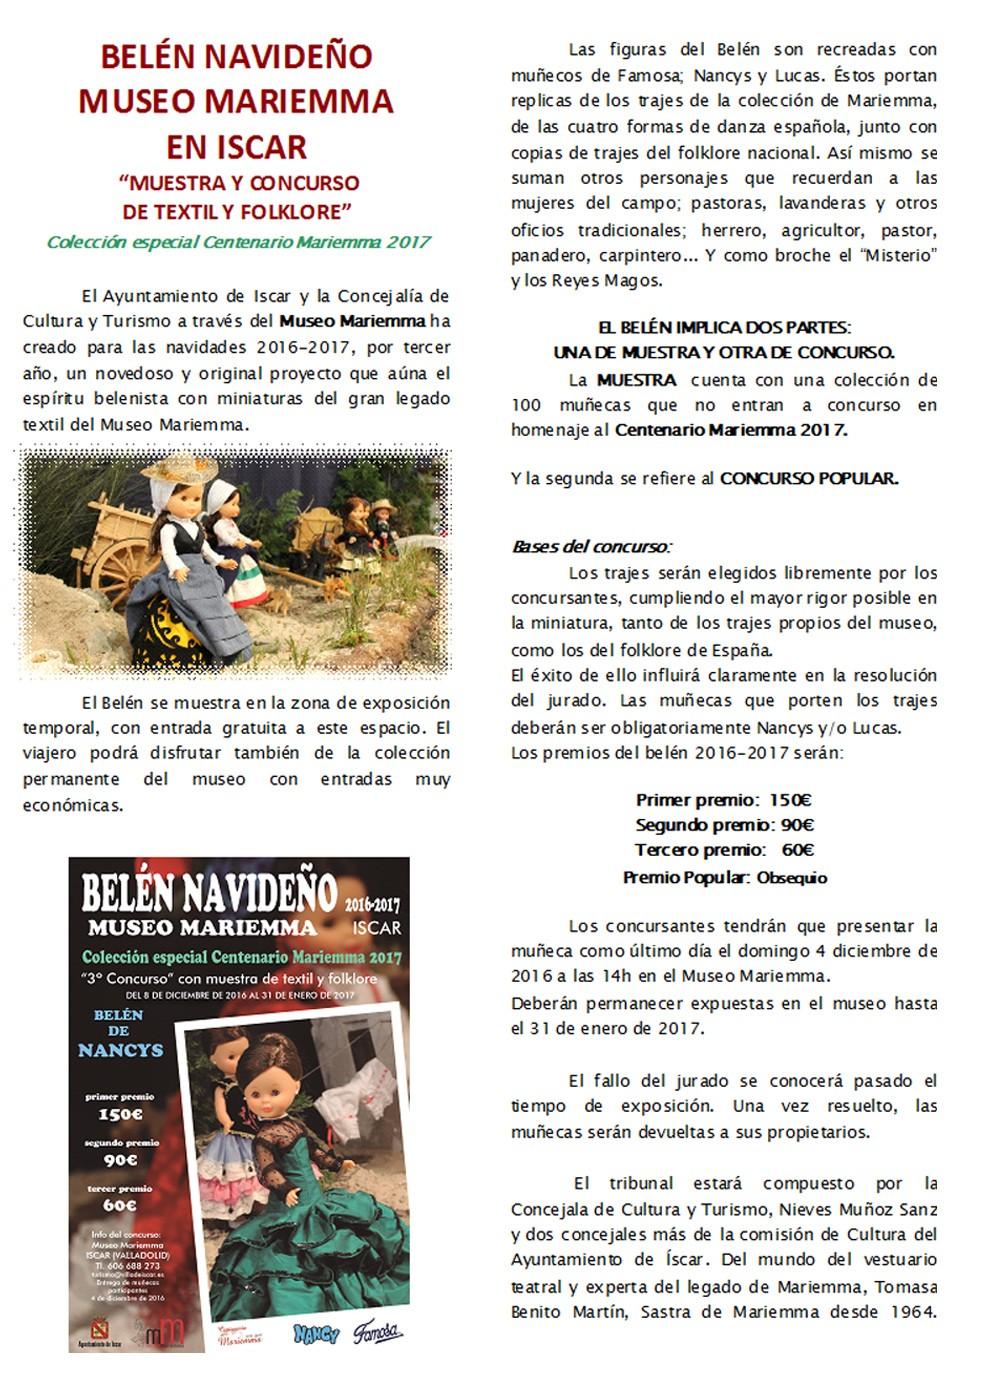 bases-concurso-belen-nancys-16-17